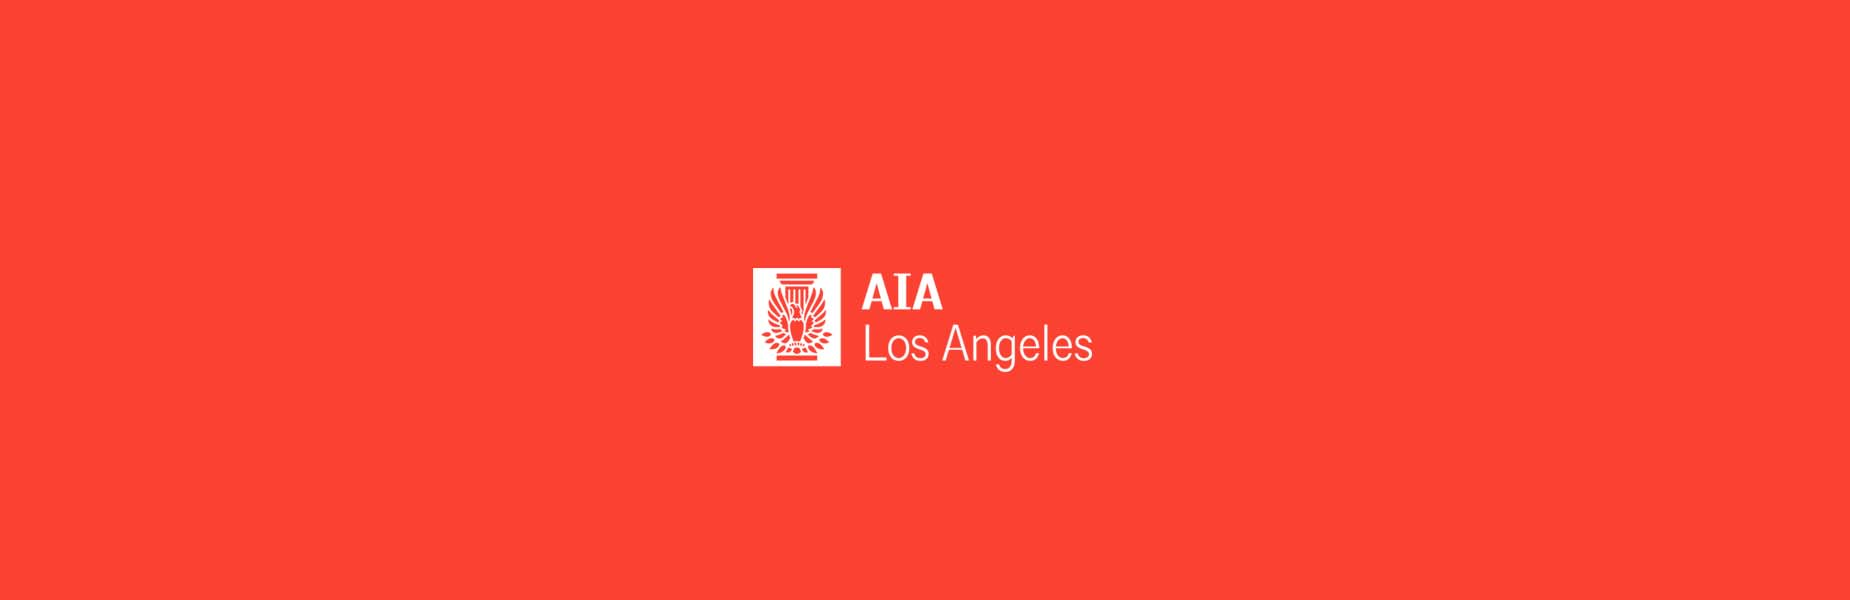 Fullsize Of Aia Los Angeles